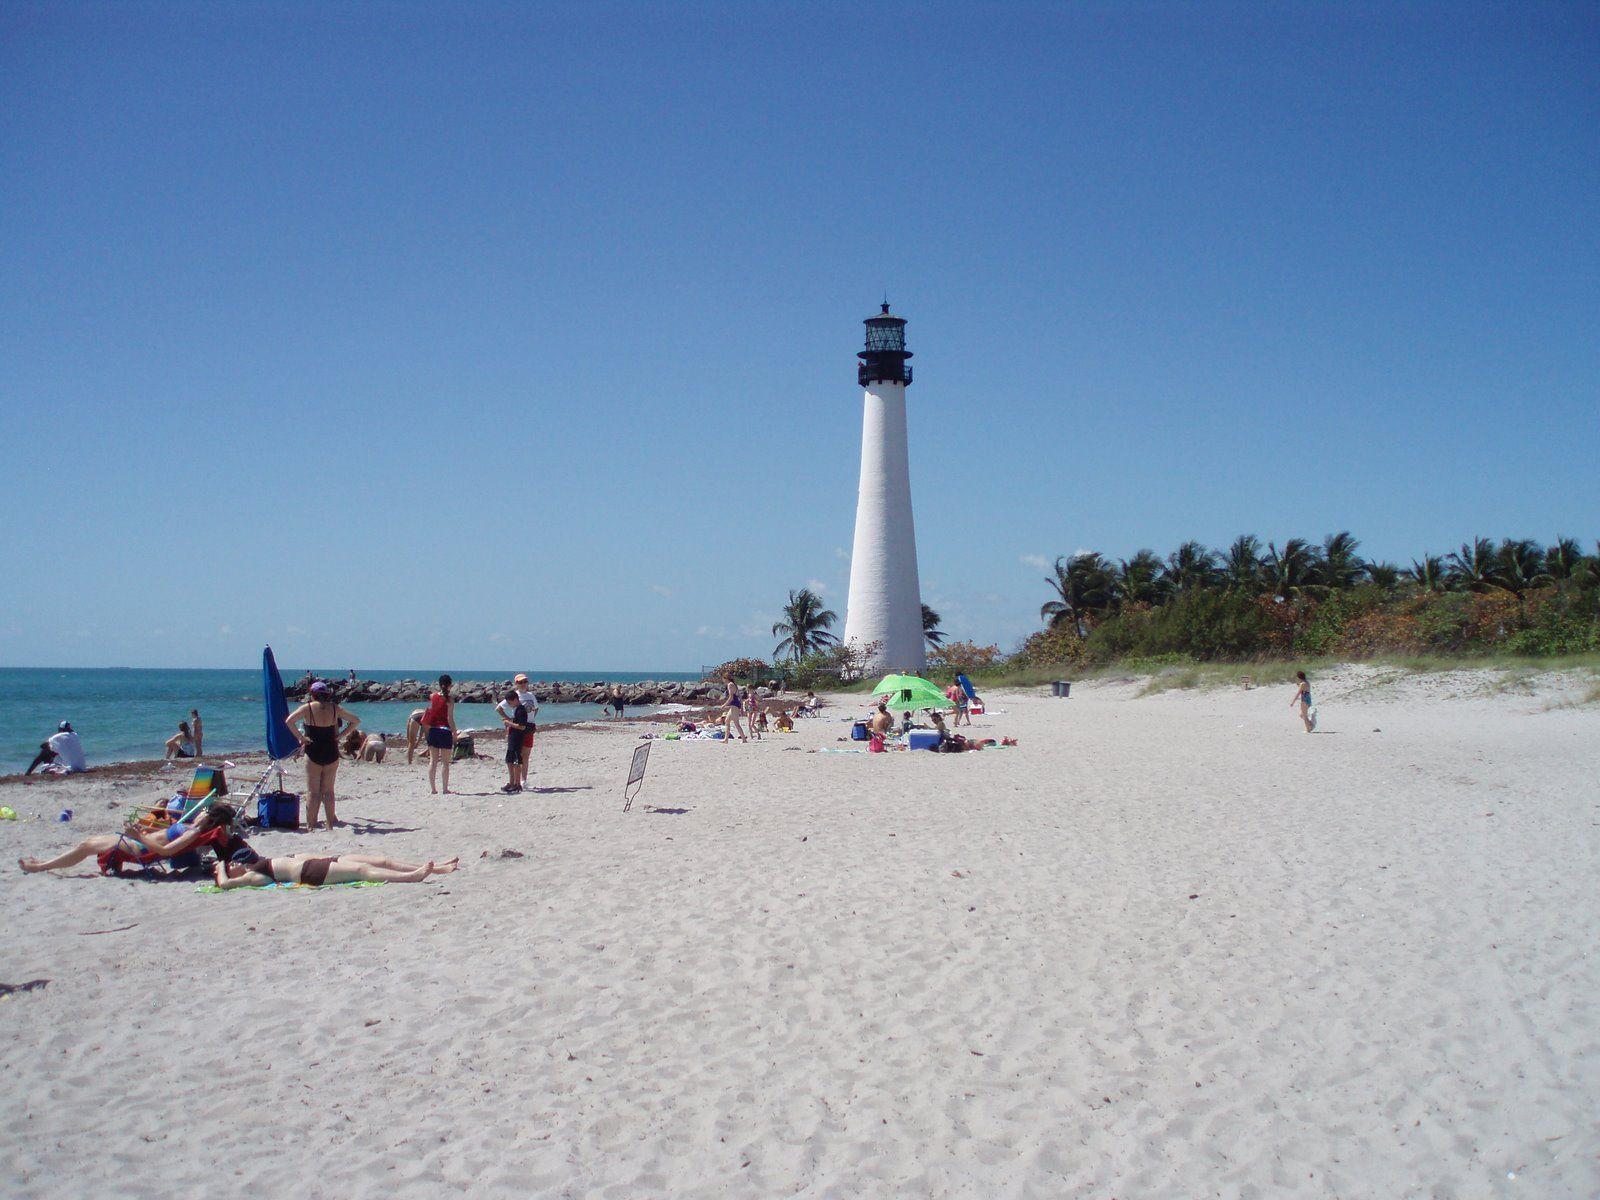 Cape Florida Beach Also Known As El Farito By Spanish Speakers